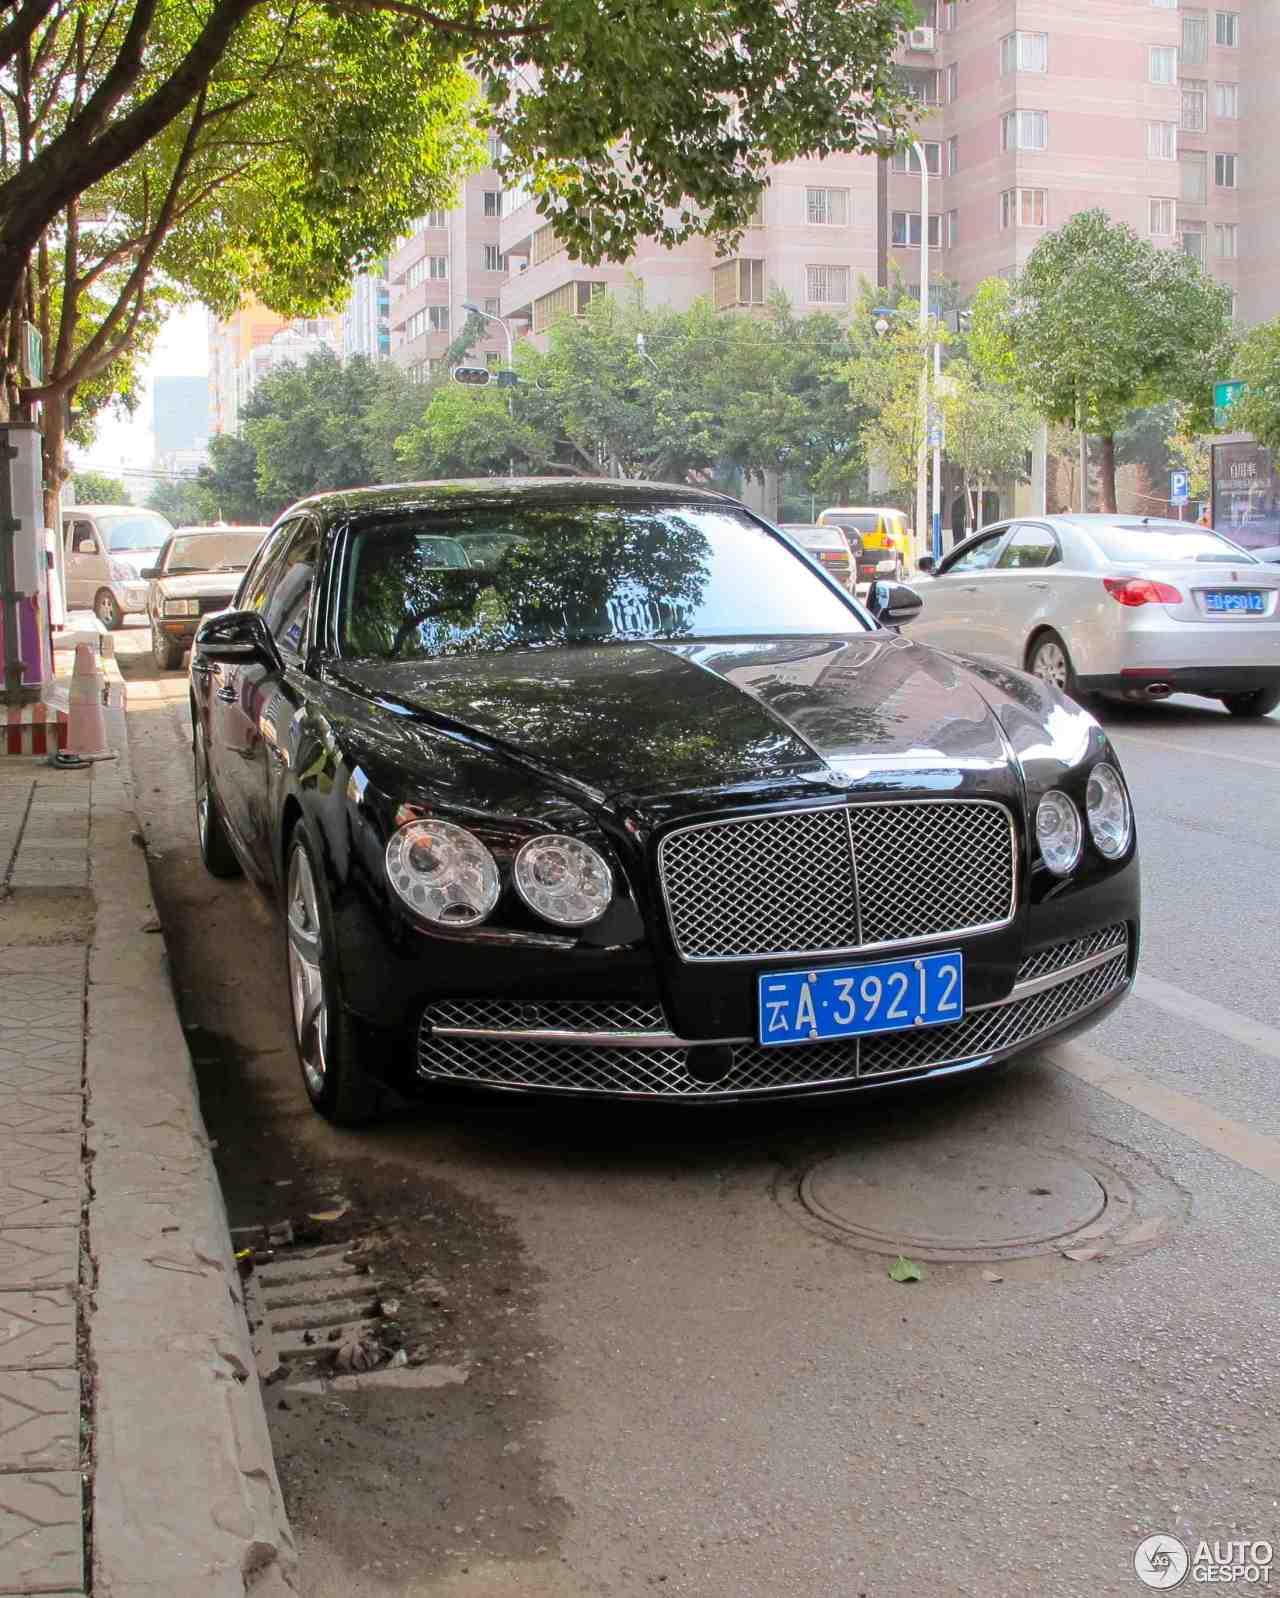 2012 Bentley Flying Spur W12 Diamond Black: Bentley Flying Spur W12